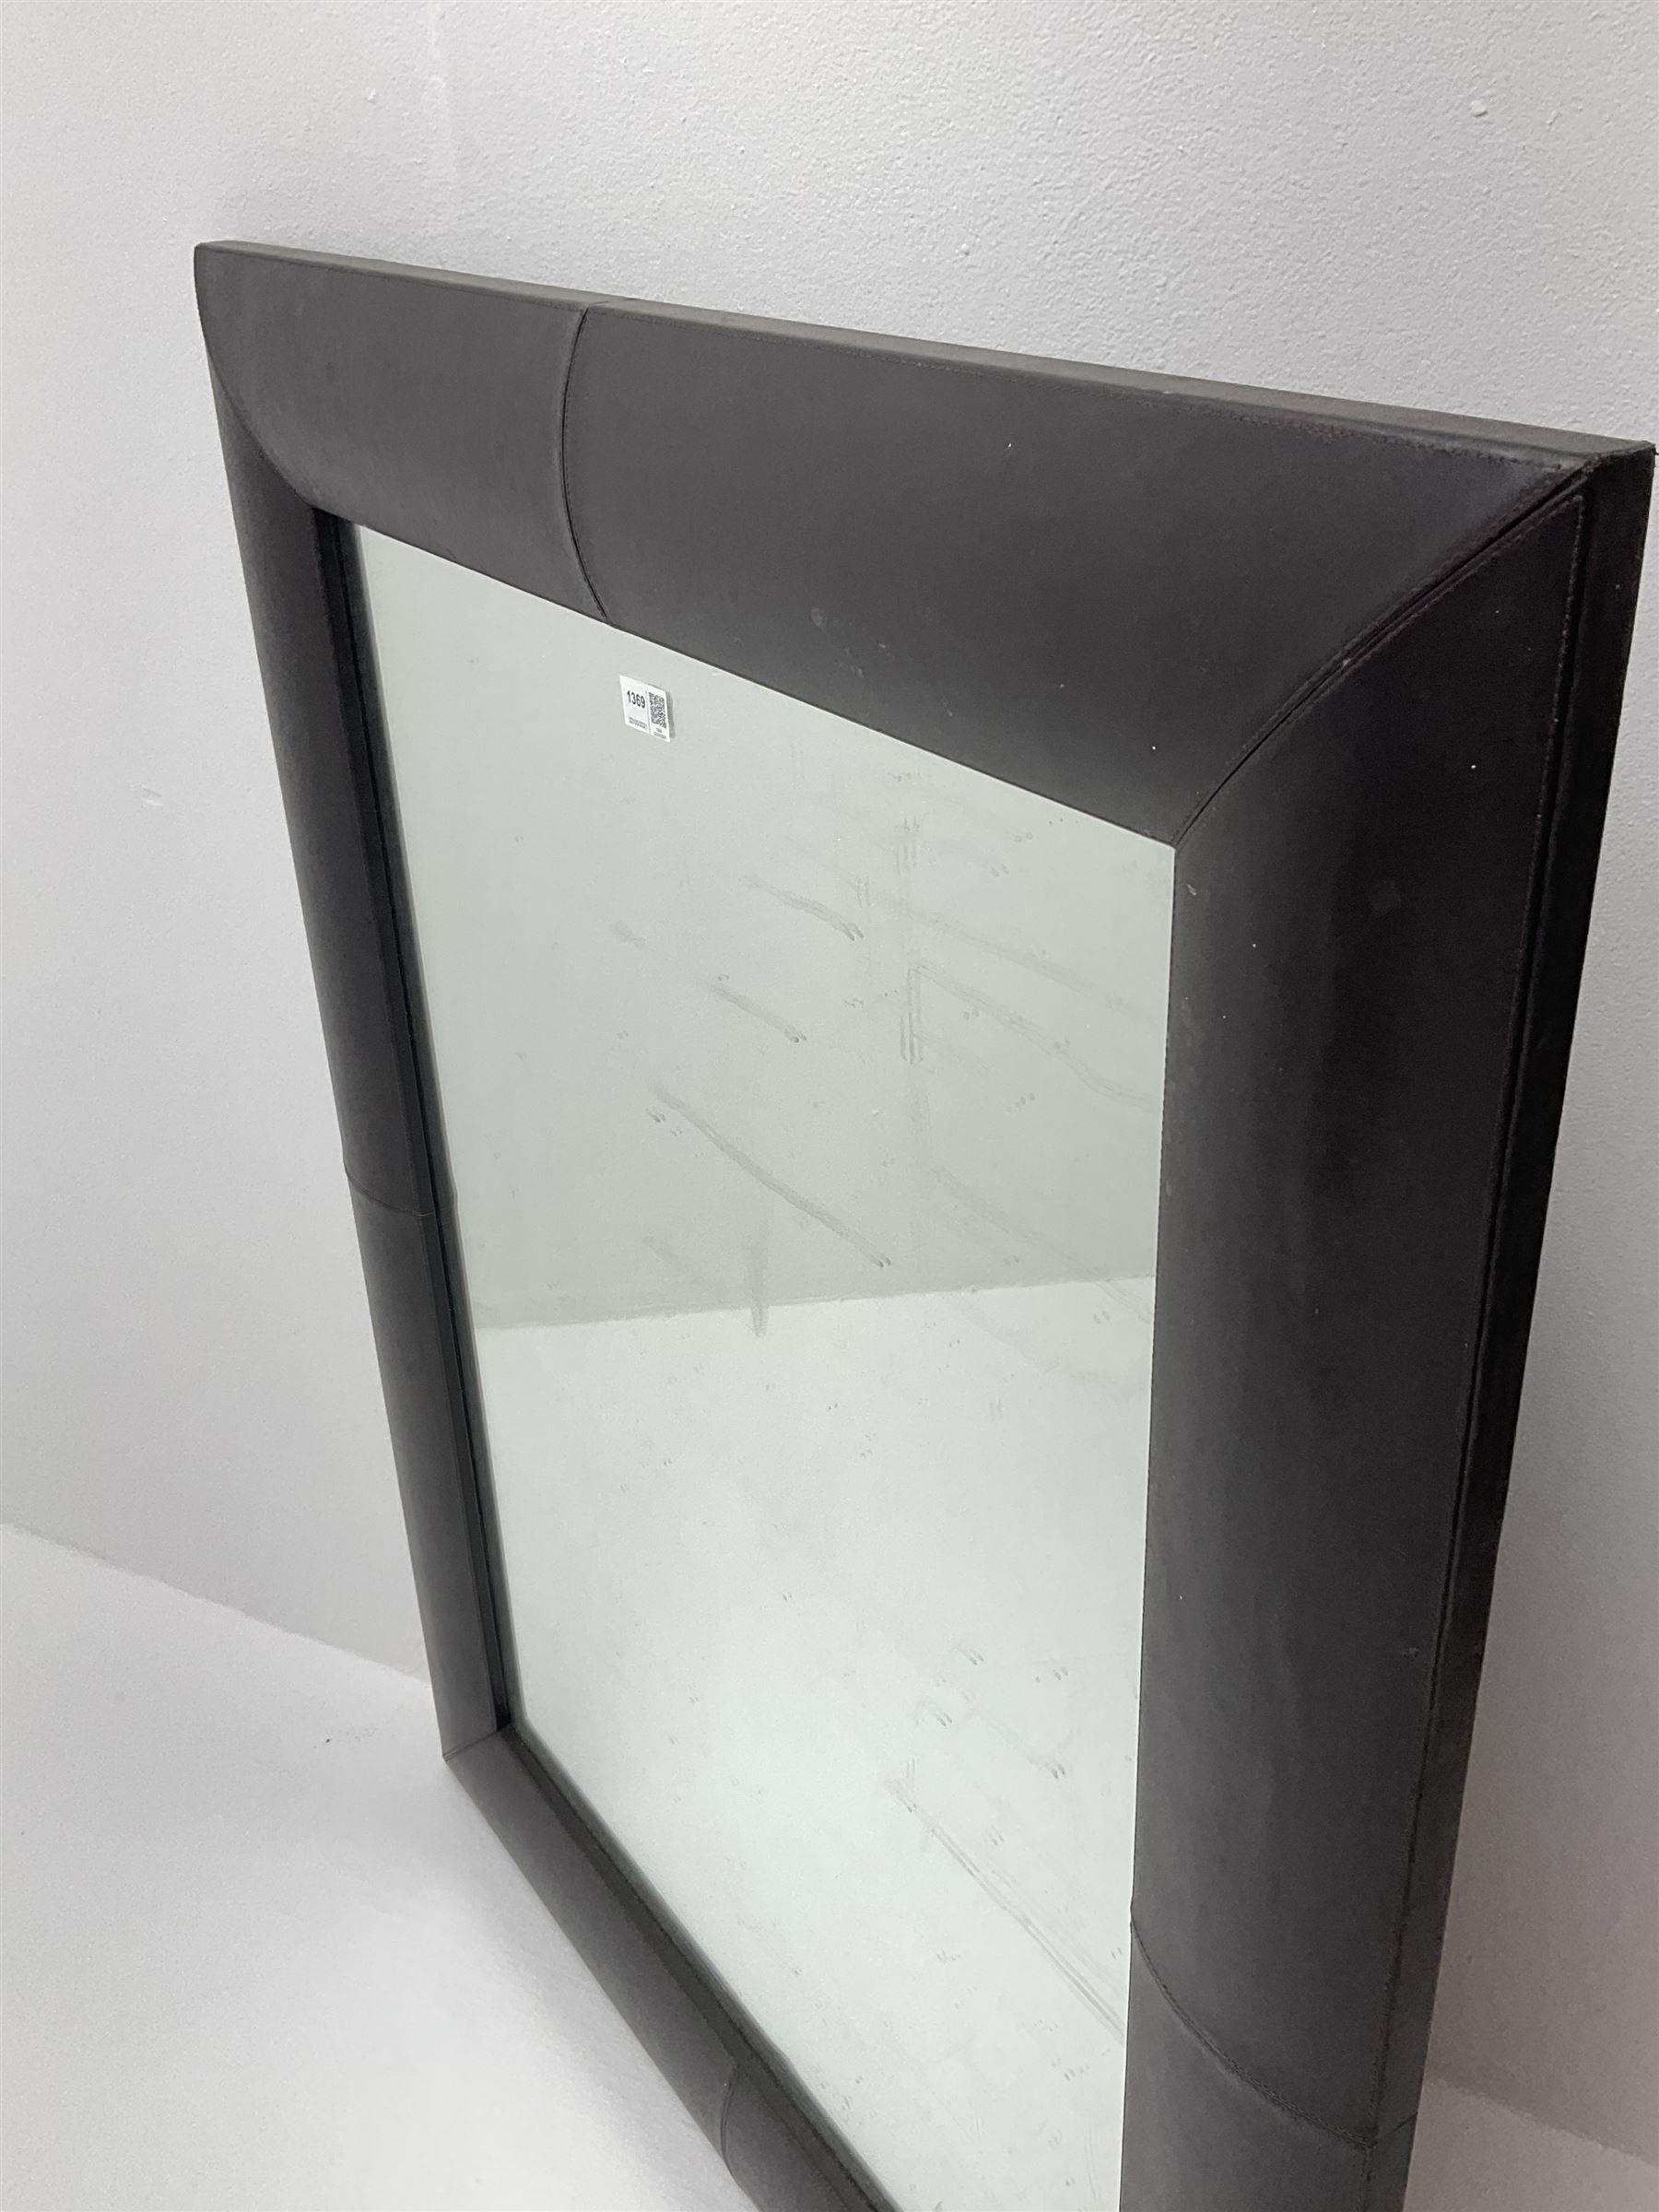 Rectangular leather framed mirror - Image 2 of 2